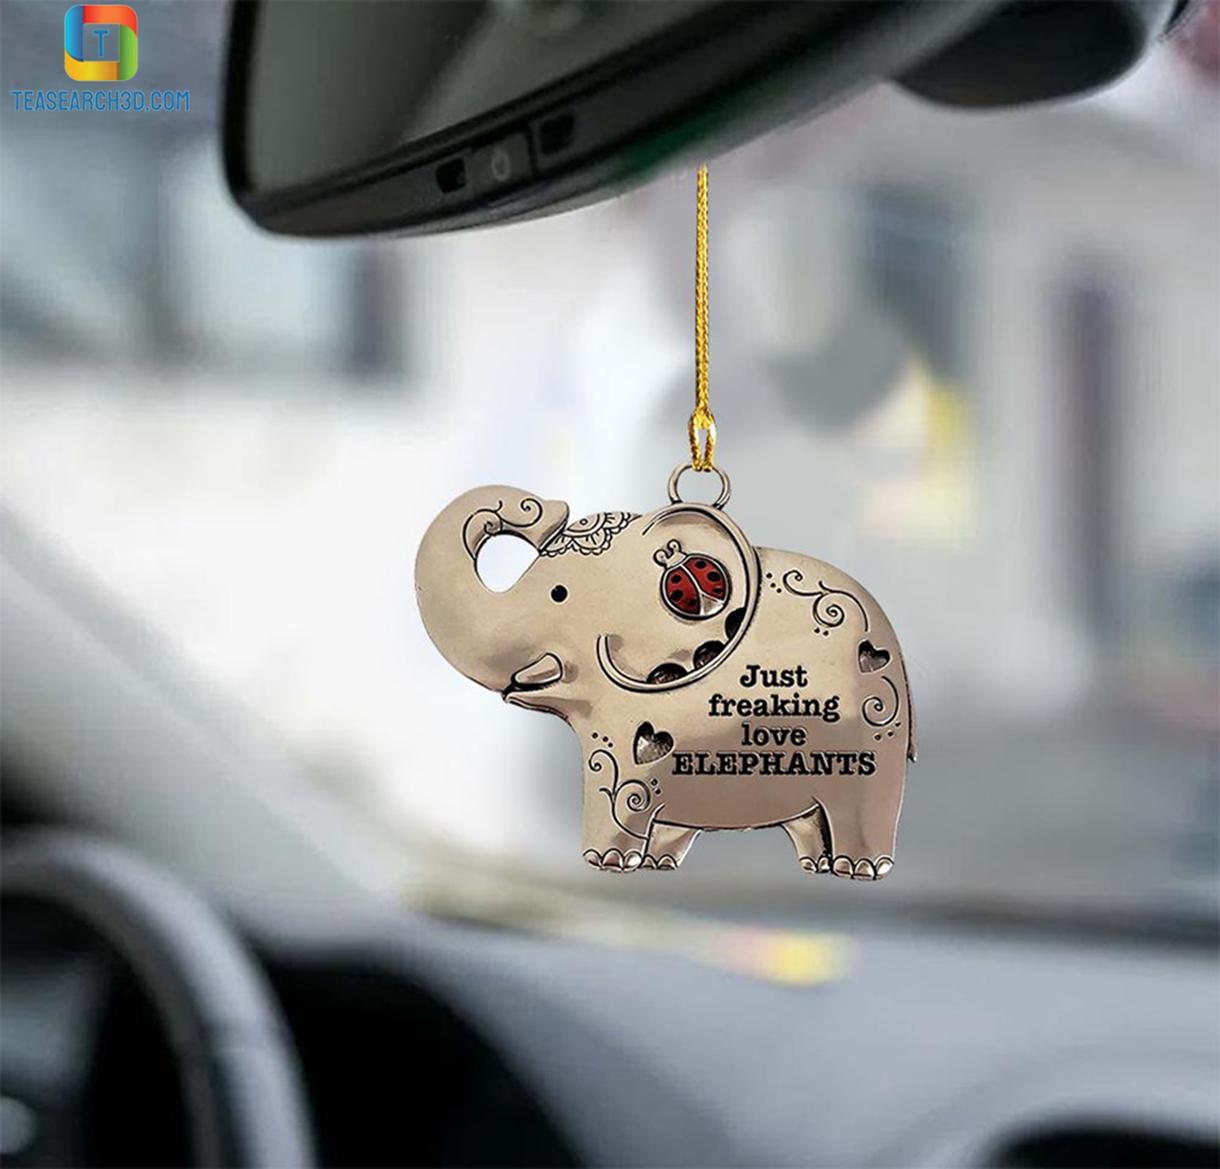 Elephant just freaking love elephants car hanging ornament 2